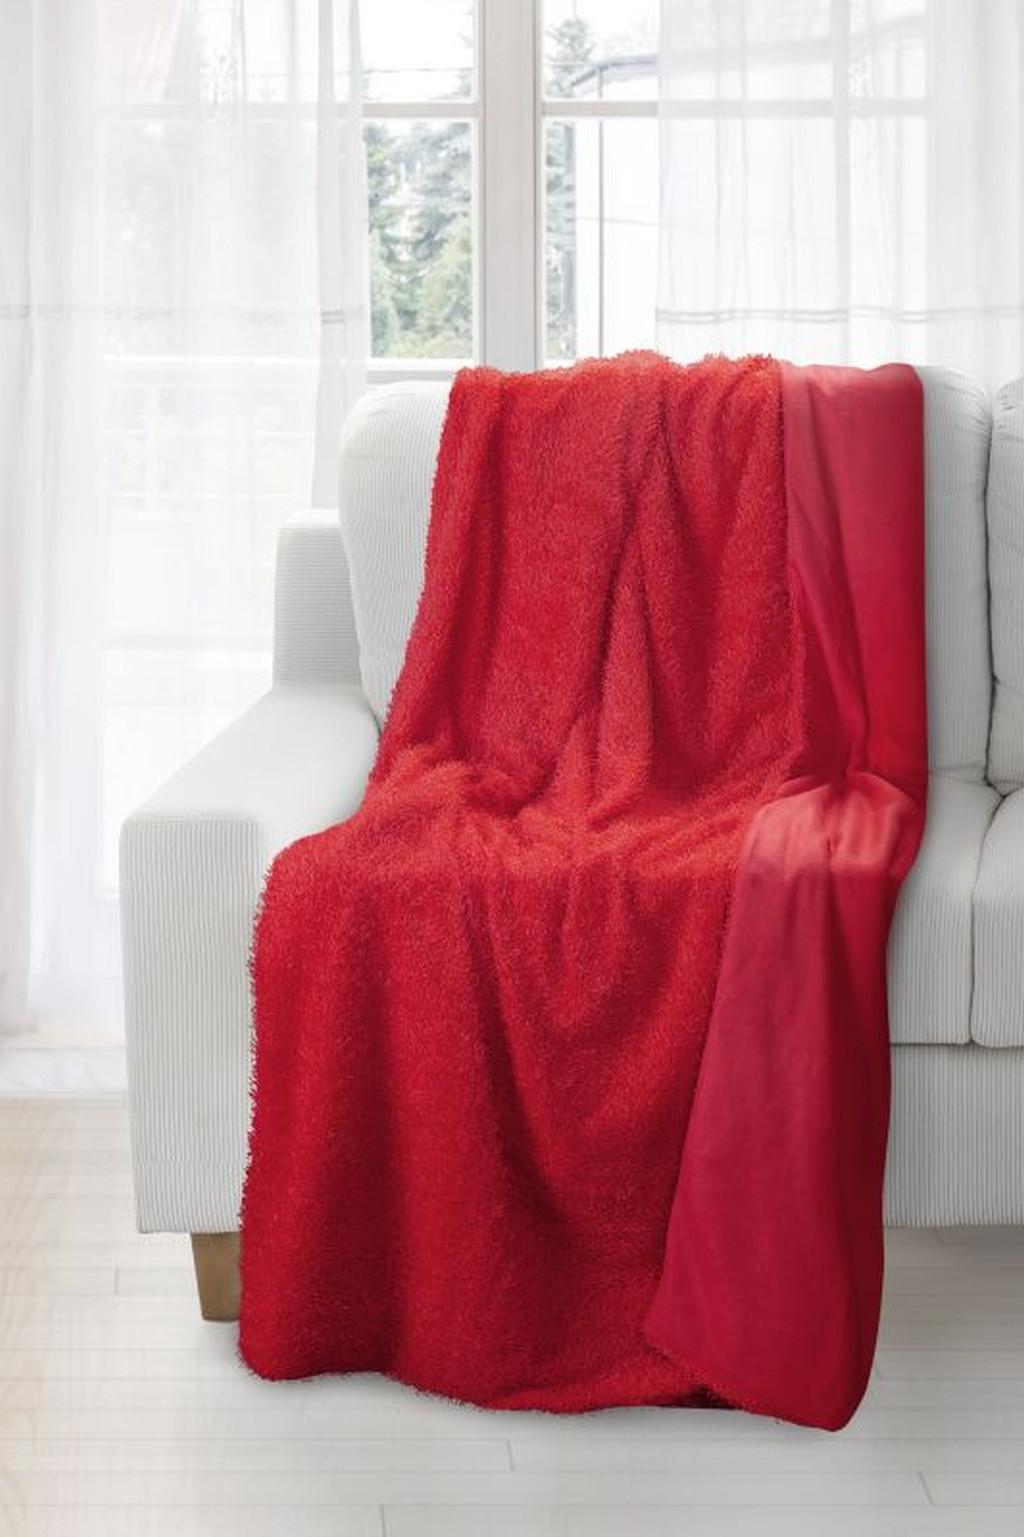 Červená kvalitná huňatá deka jemná na dotyk Šírka: 70 cm. dł. 150 cm